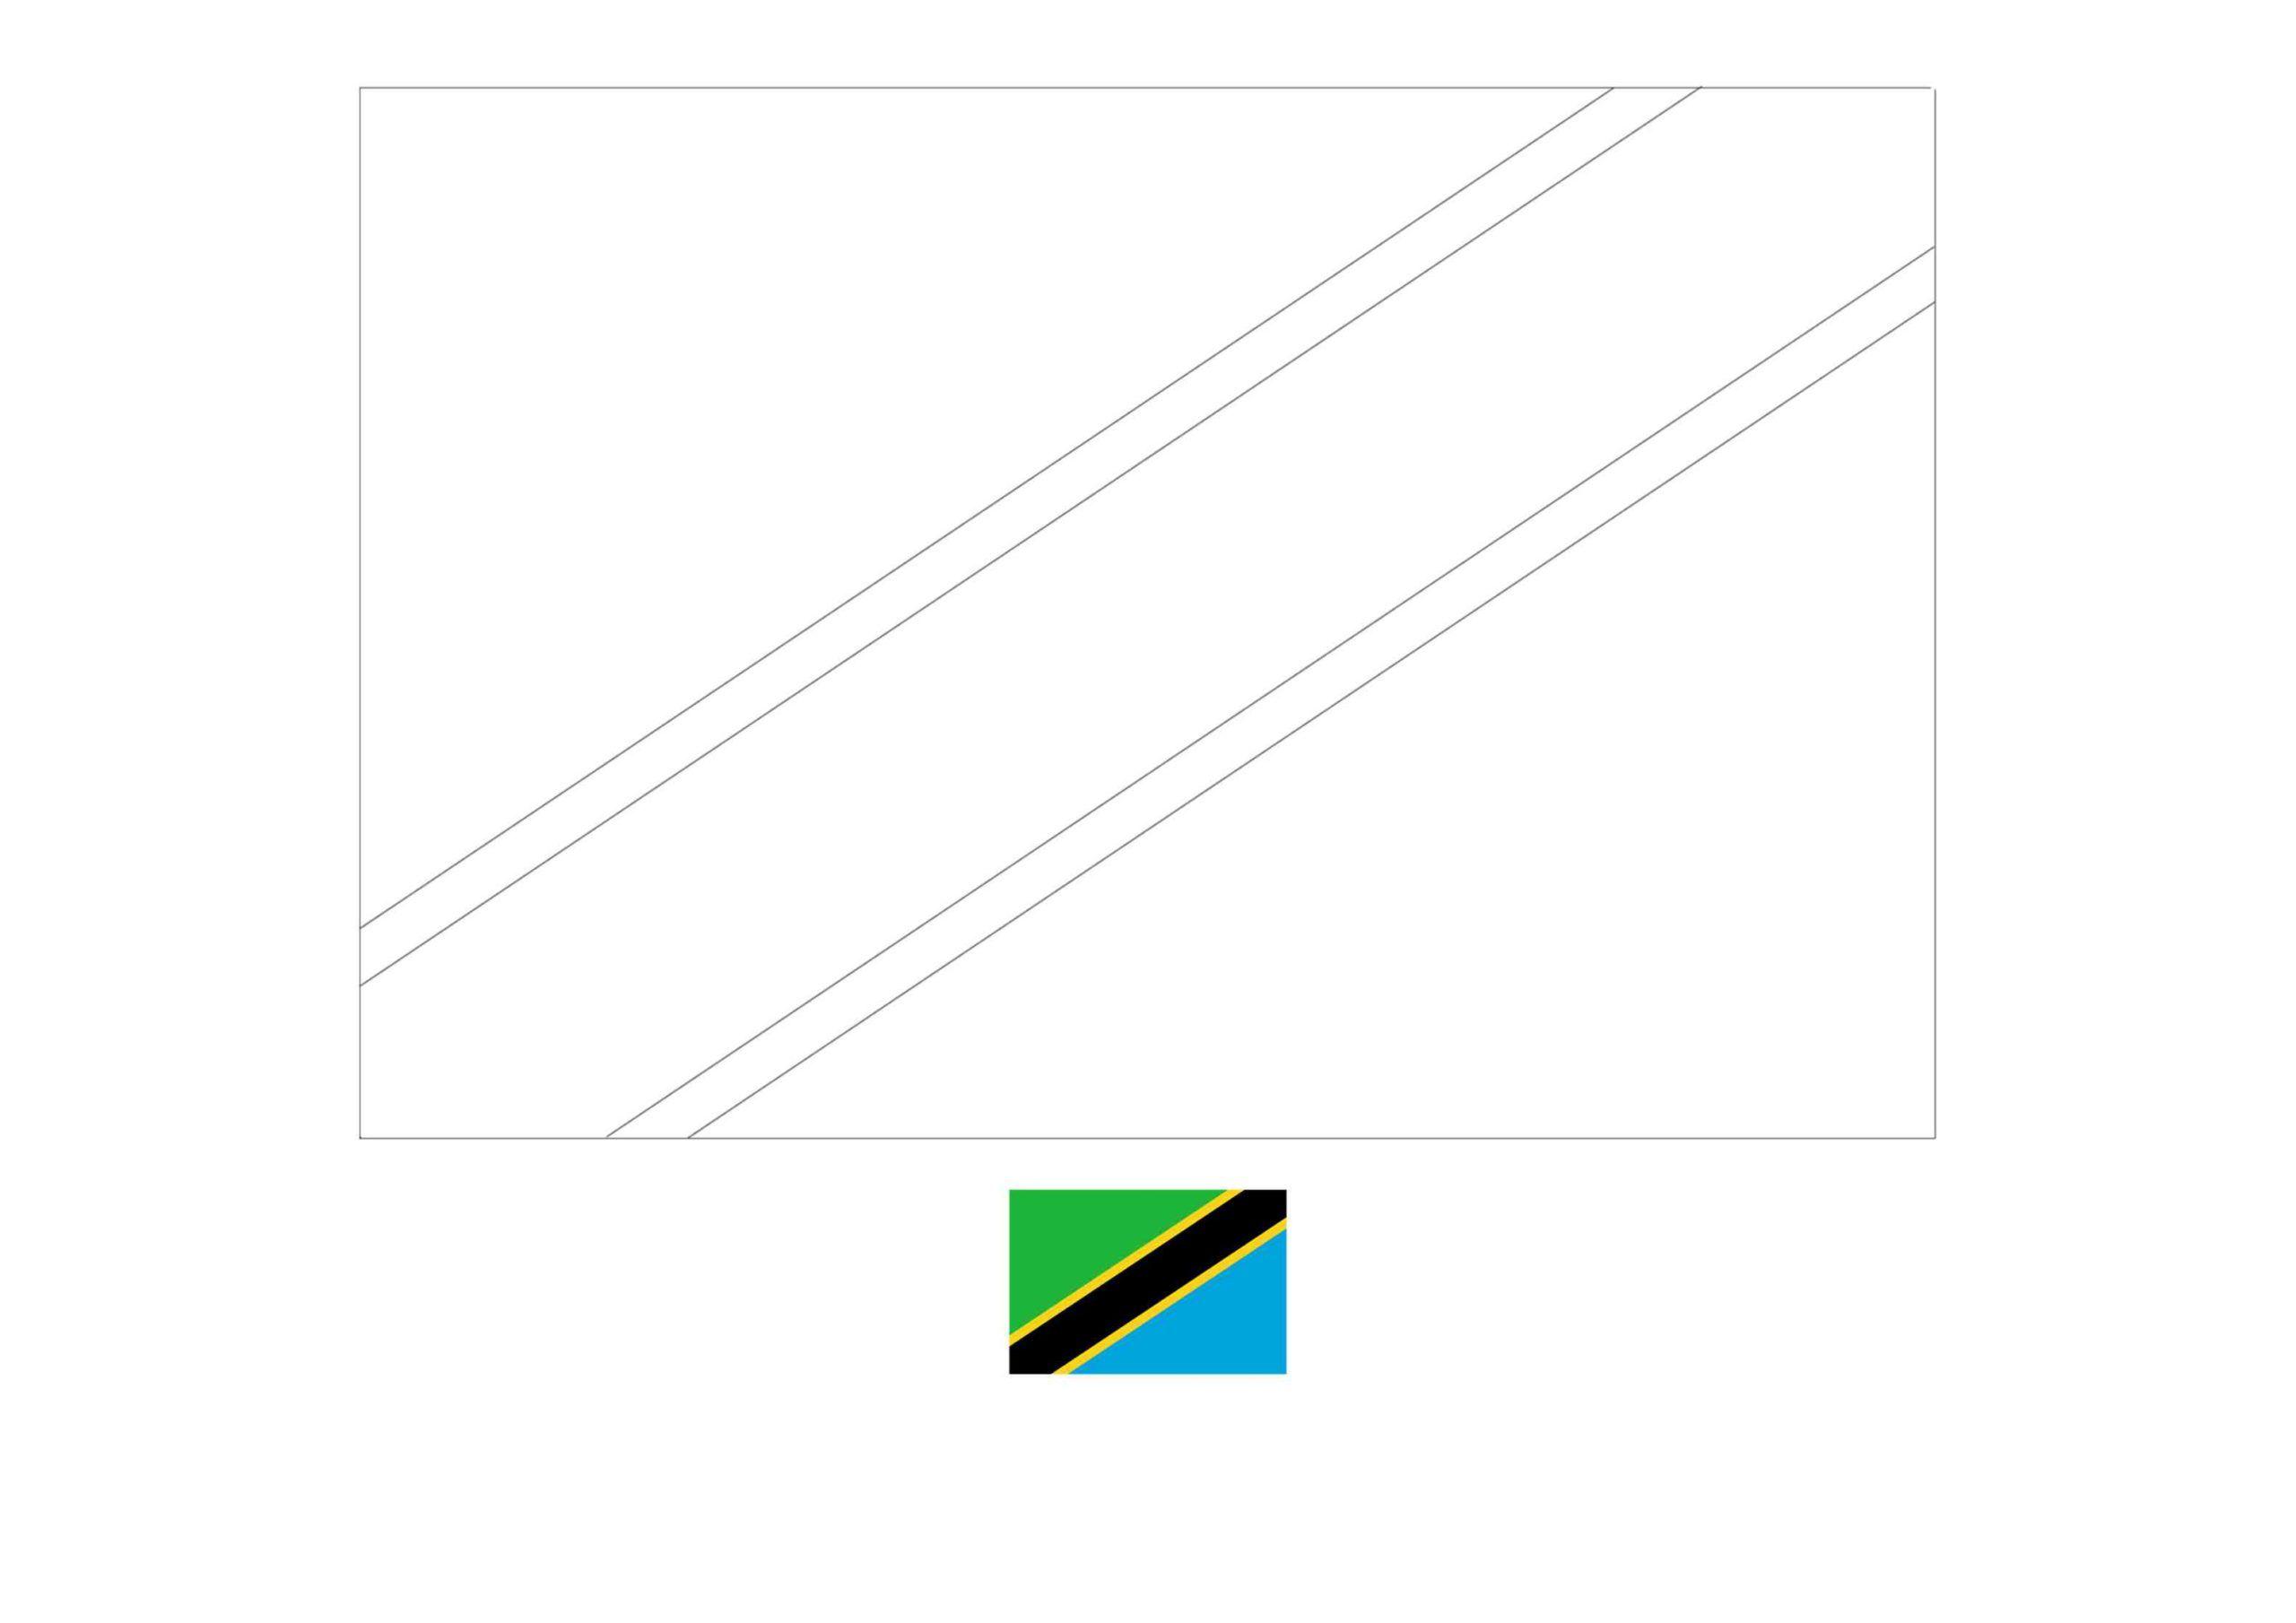 Flag Of Tanzania Coloring Page Free Coloring Sheets Coloring1